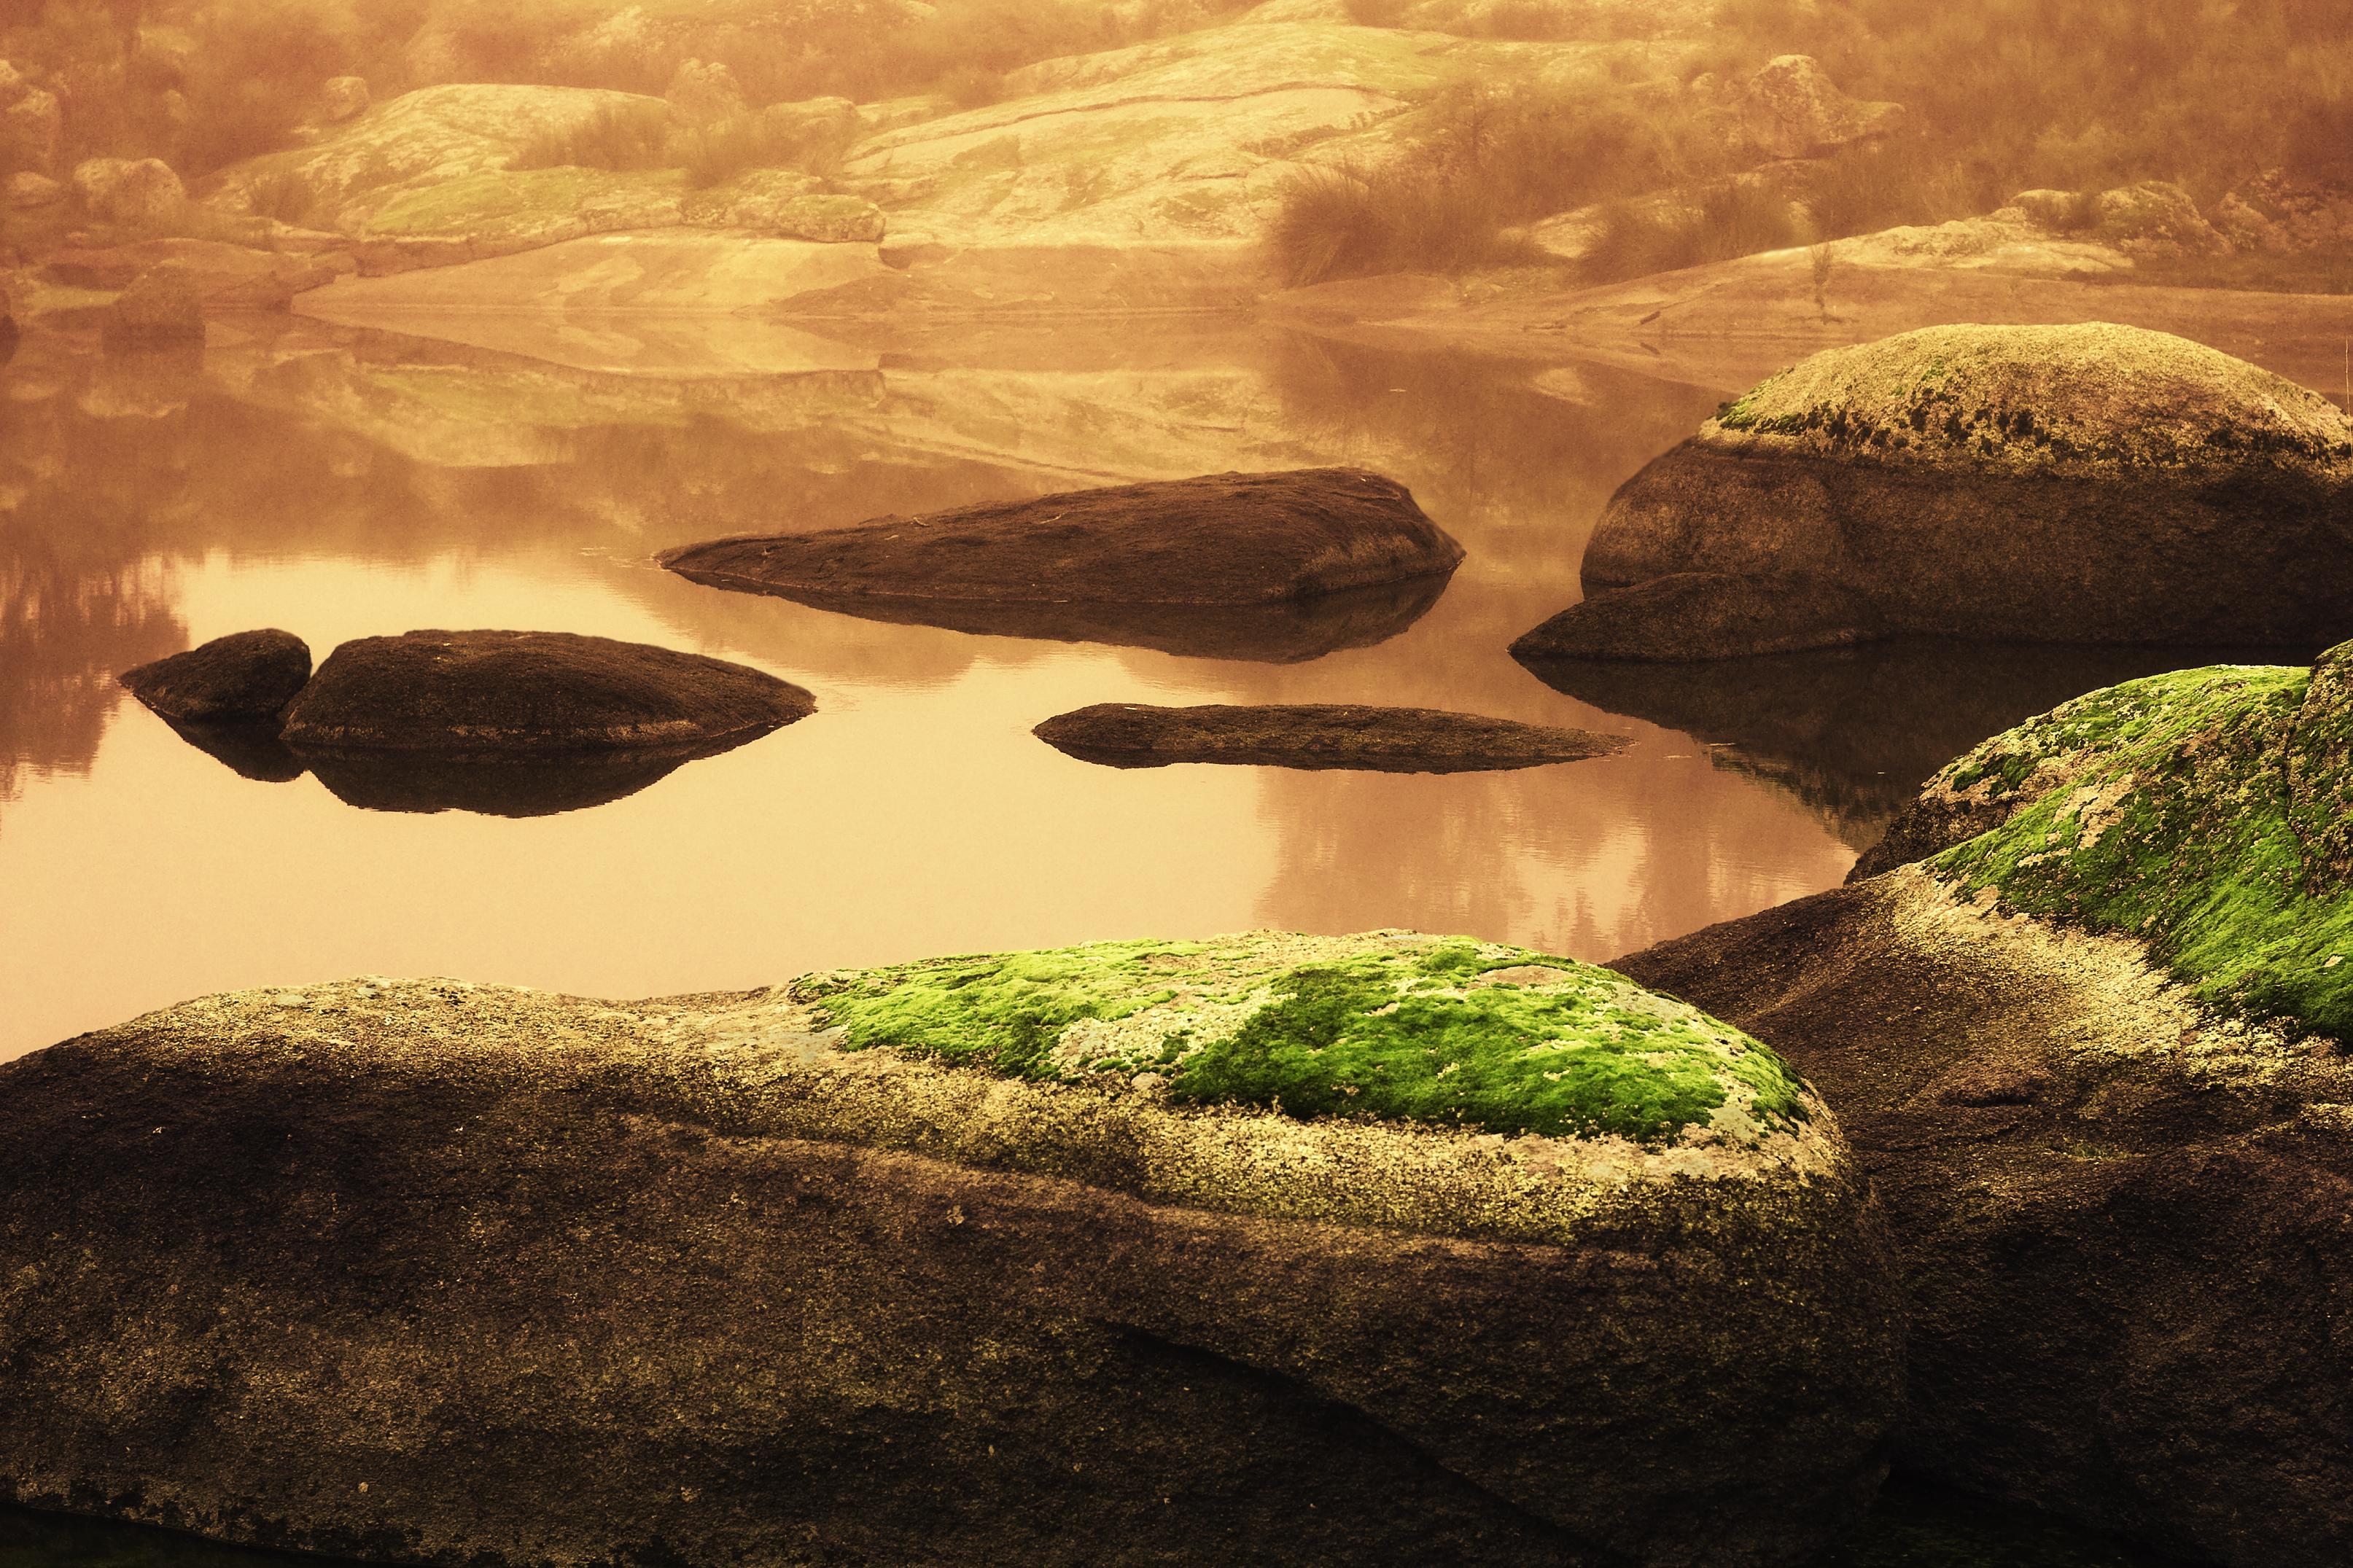 Wallpaper Landscape Photoshop Sea Lake Water Rock